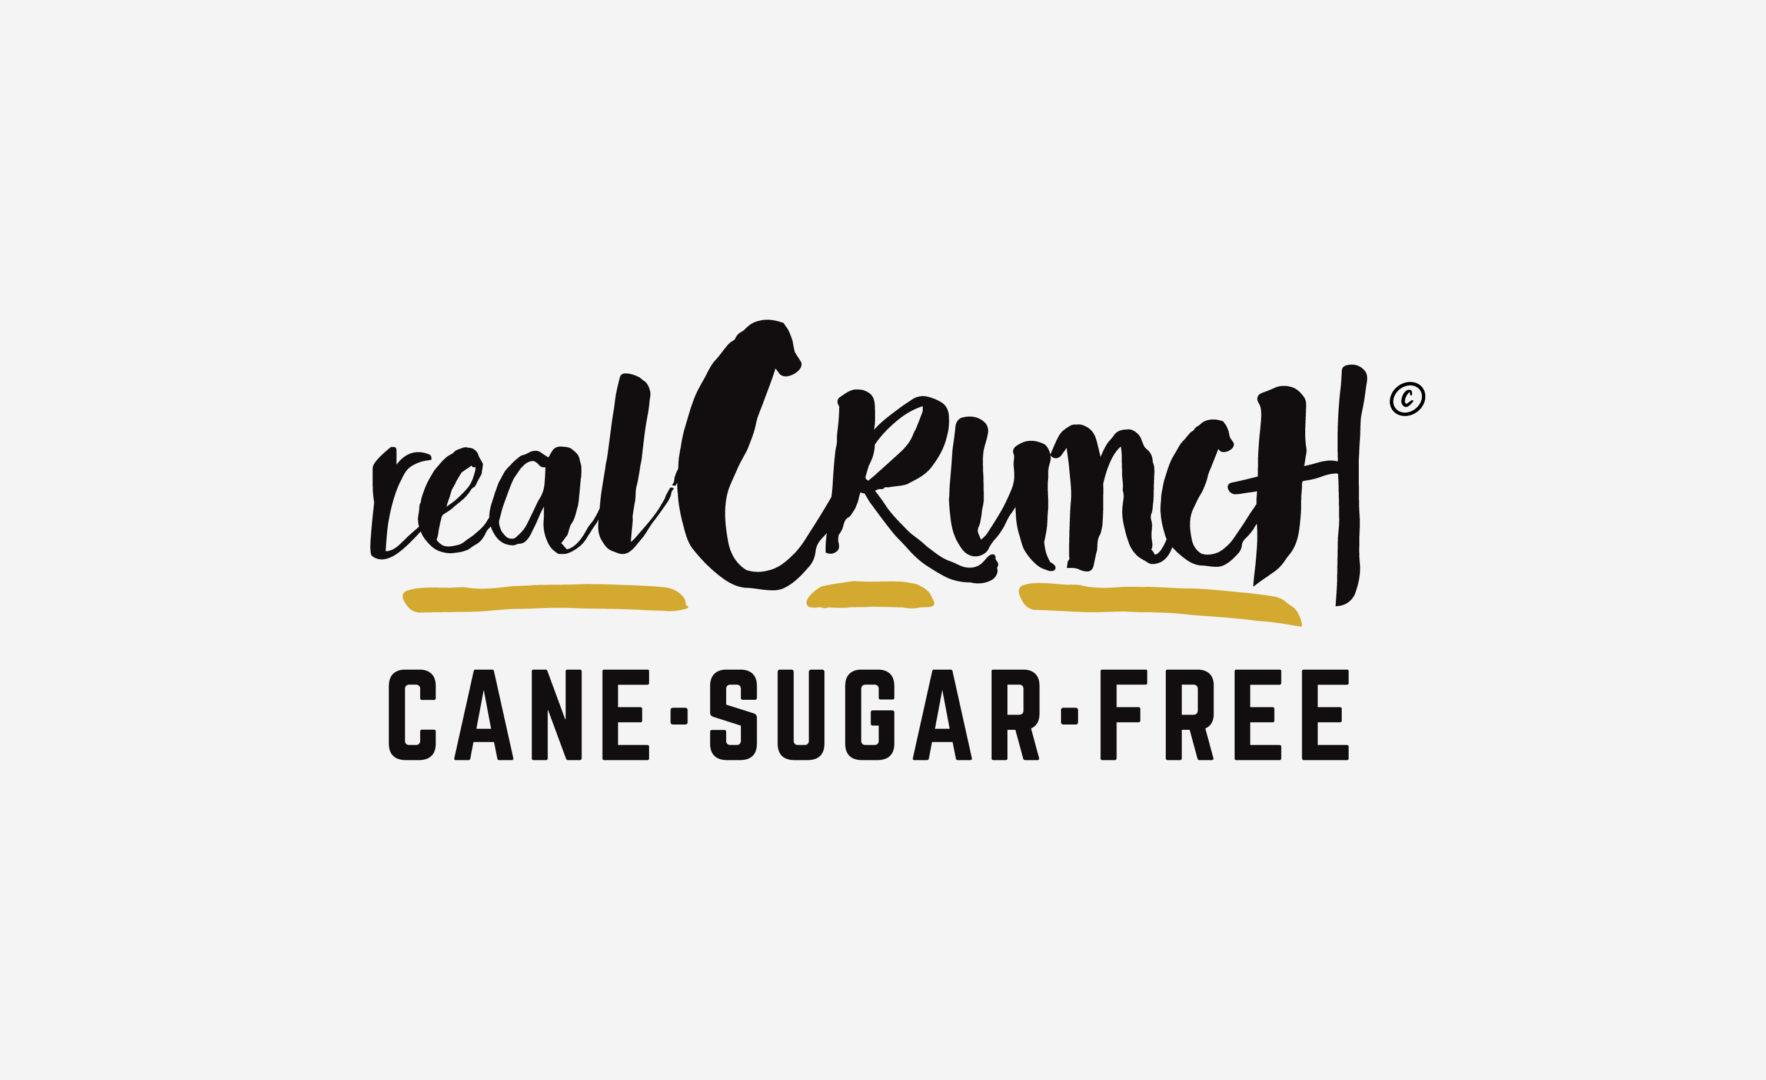 real-crunch-logo